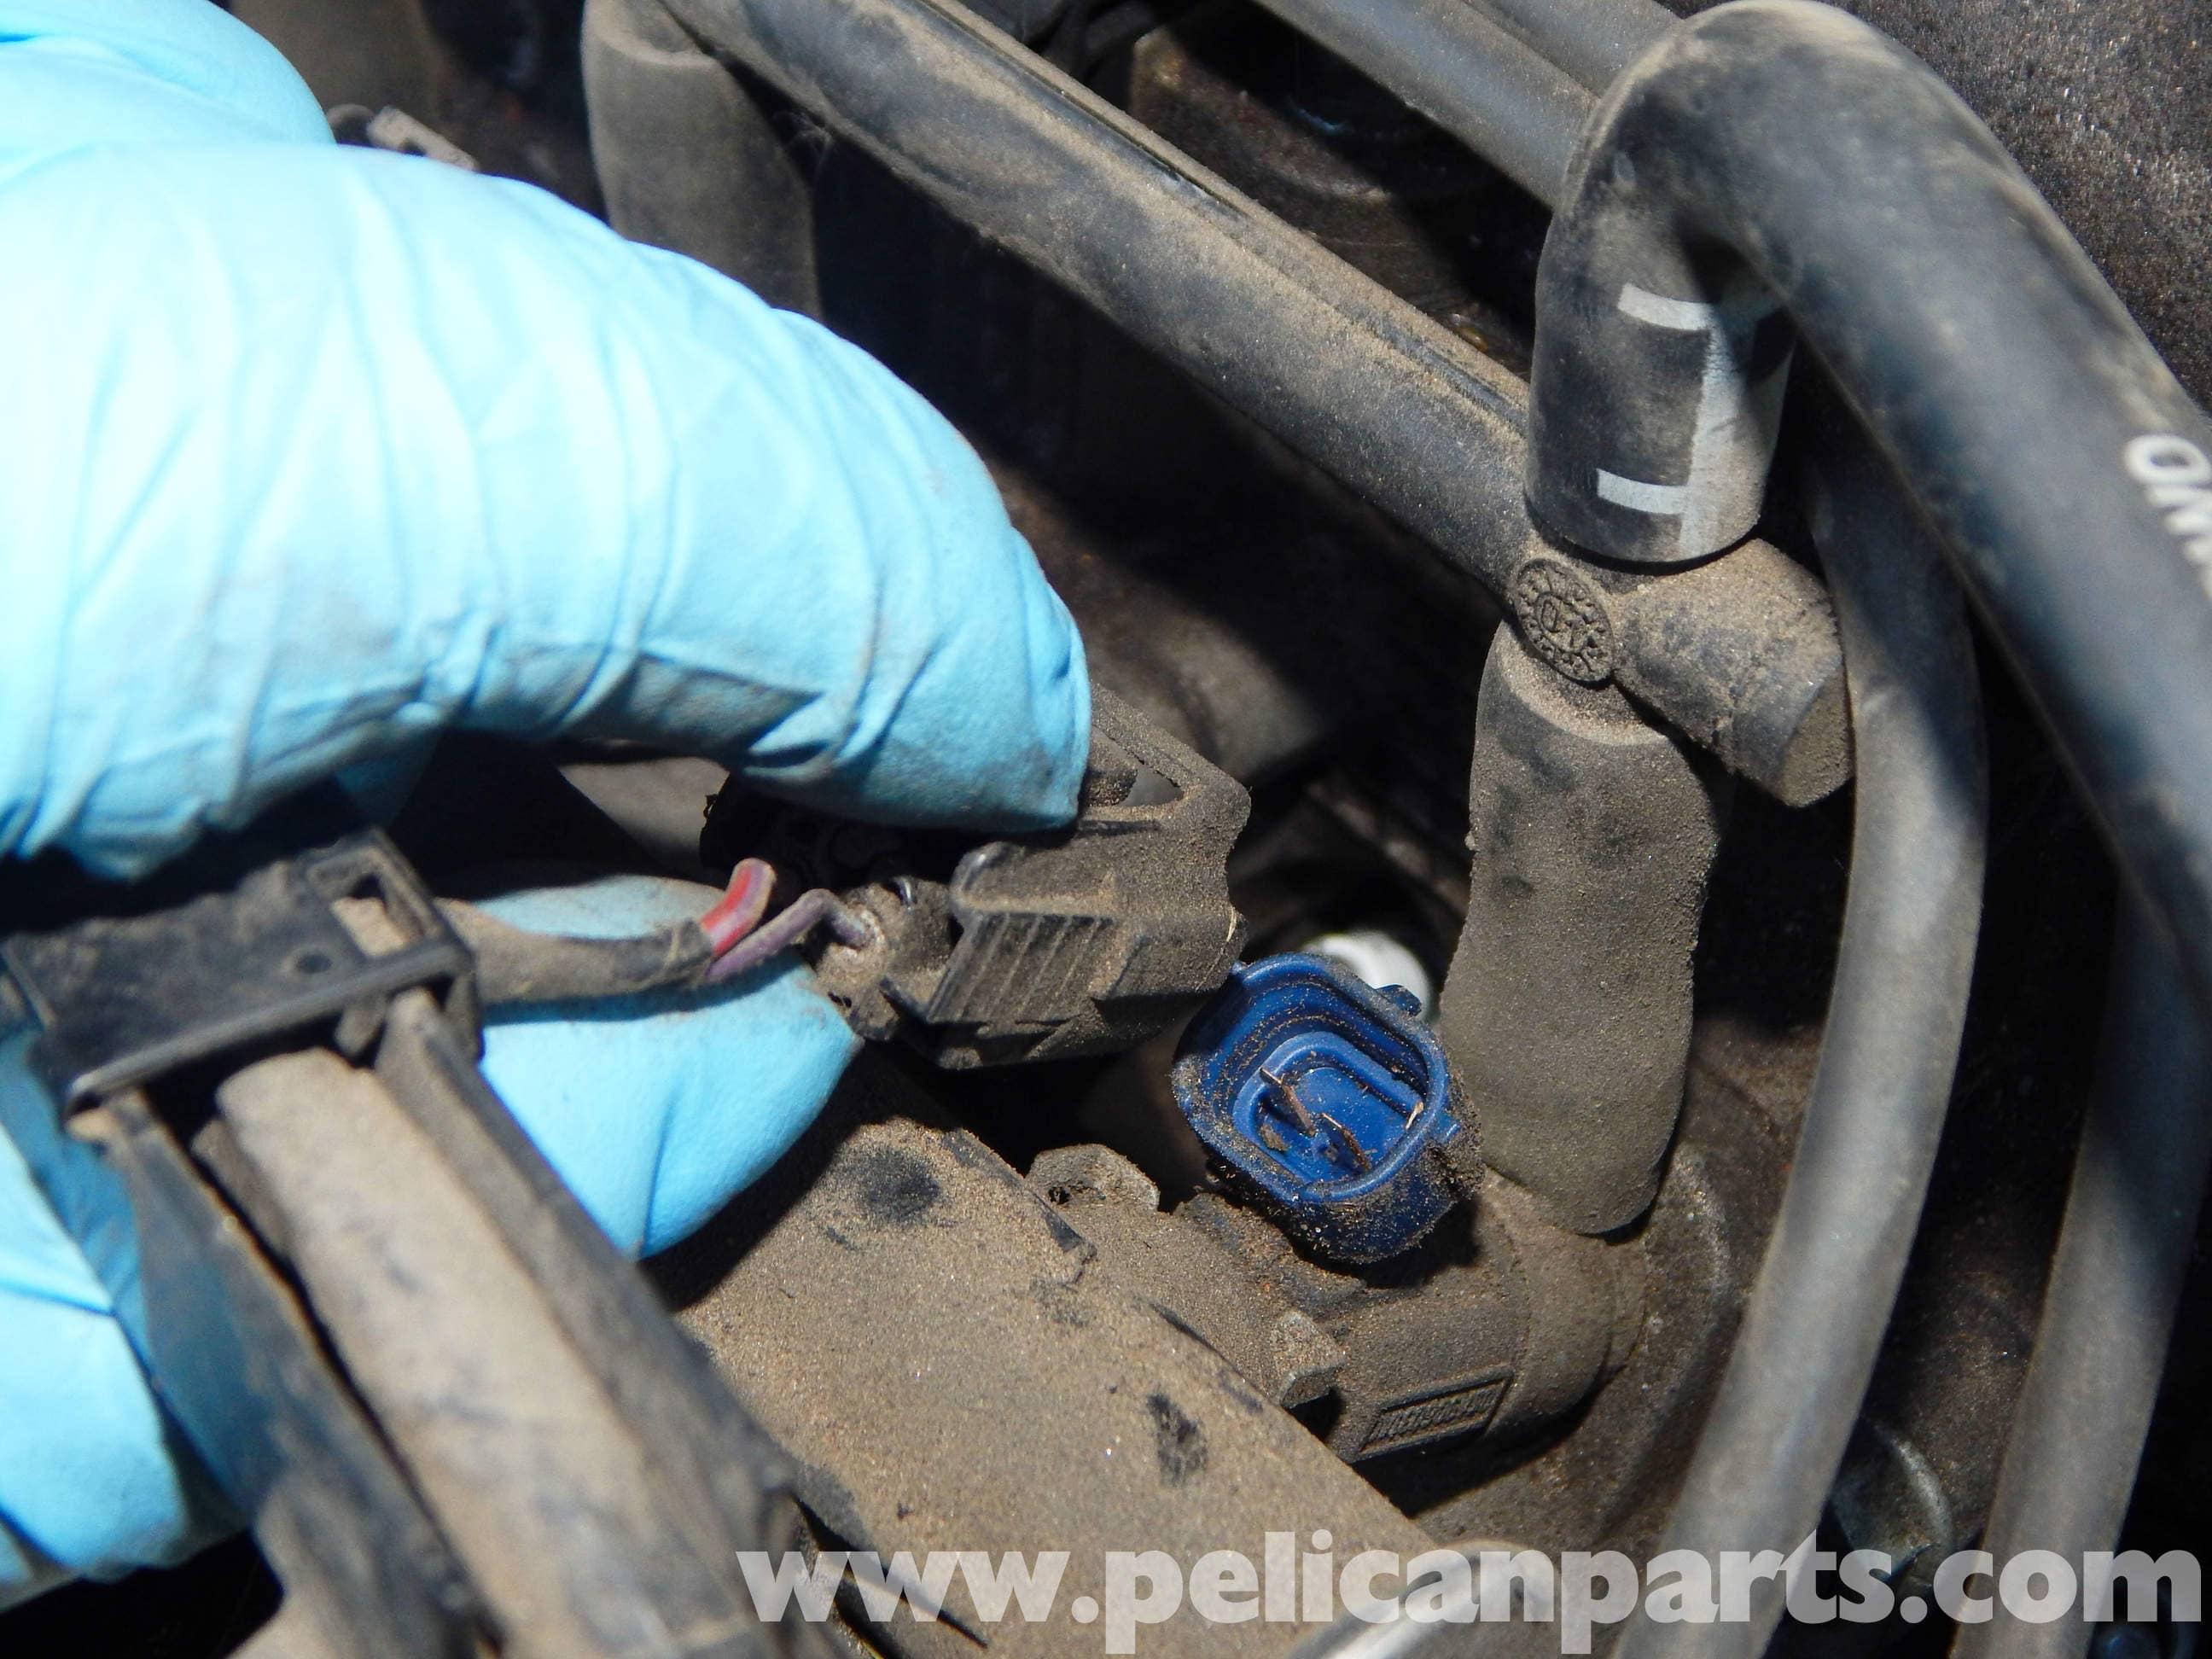 Volkswagen Jetta Mk4 Fuel Injector Replacement 20l 03 Jaguar S Type 4 2 Wiring Large Image Extra